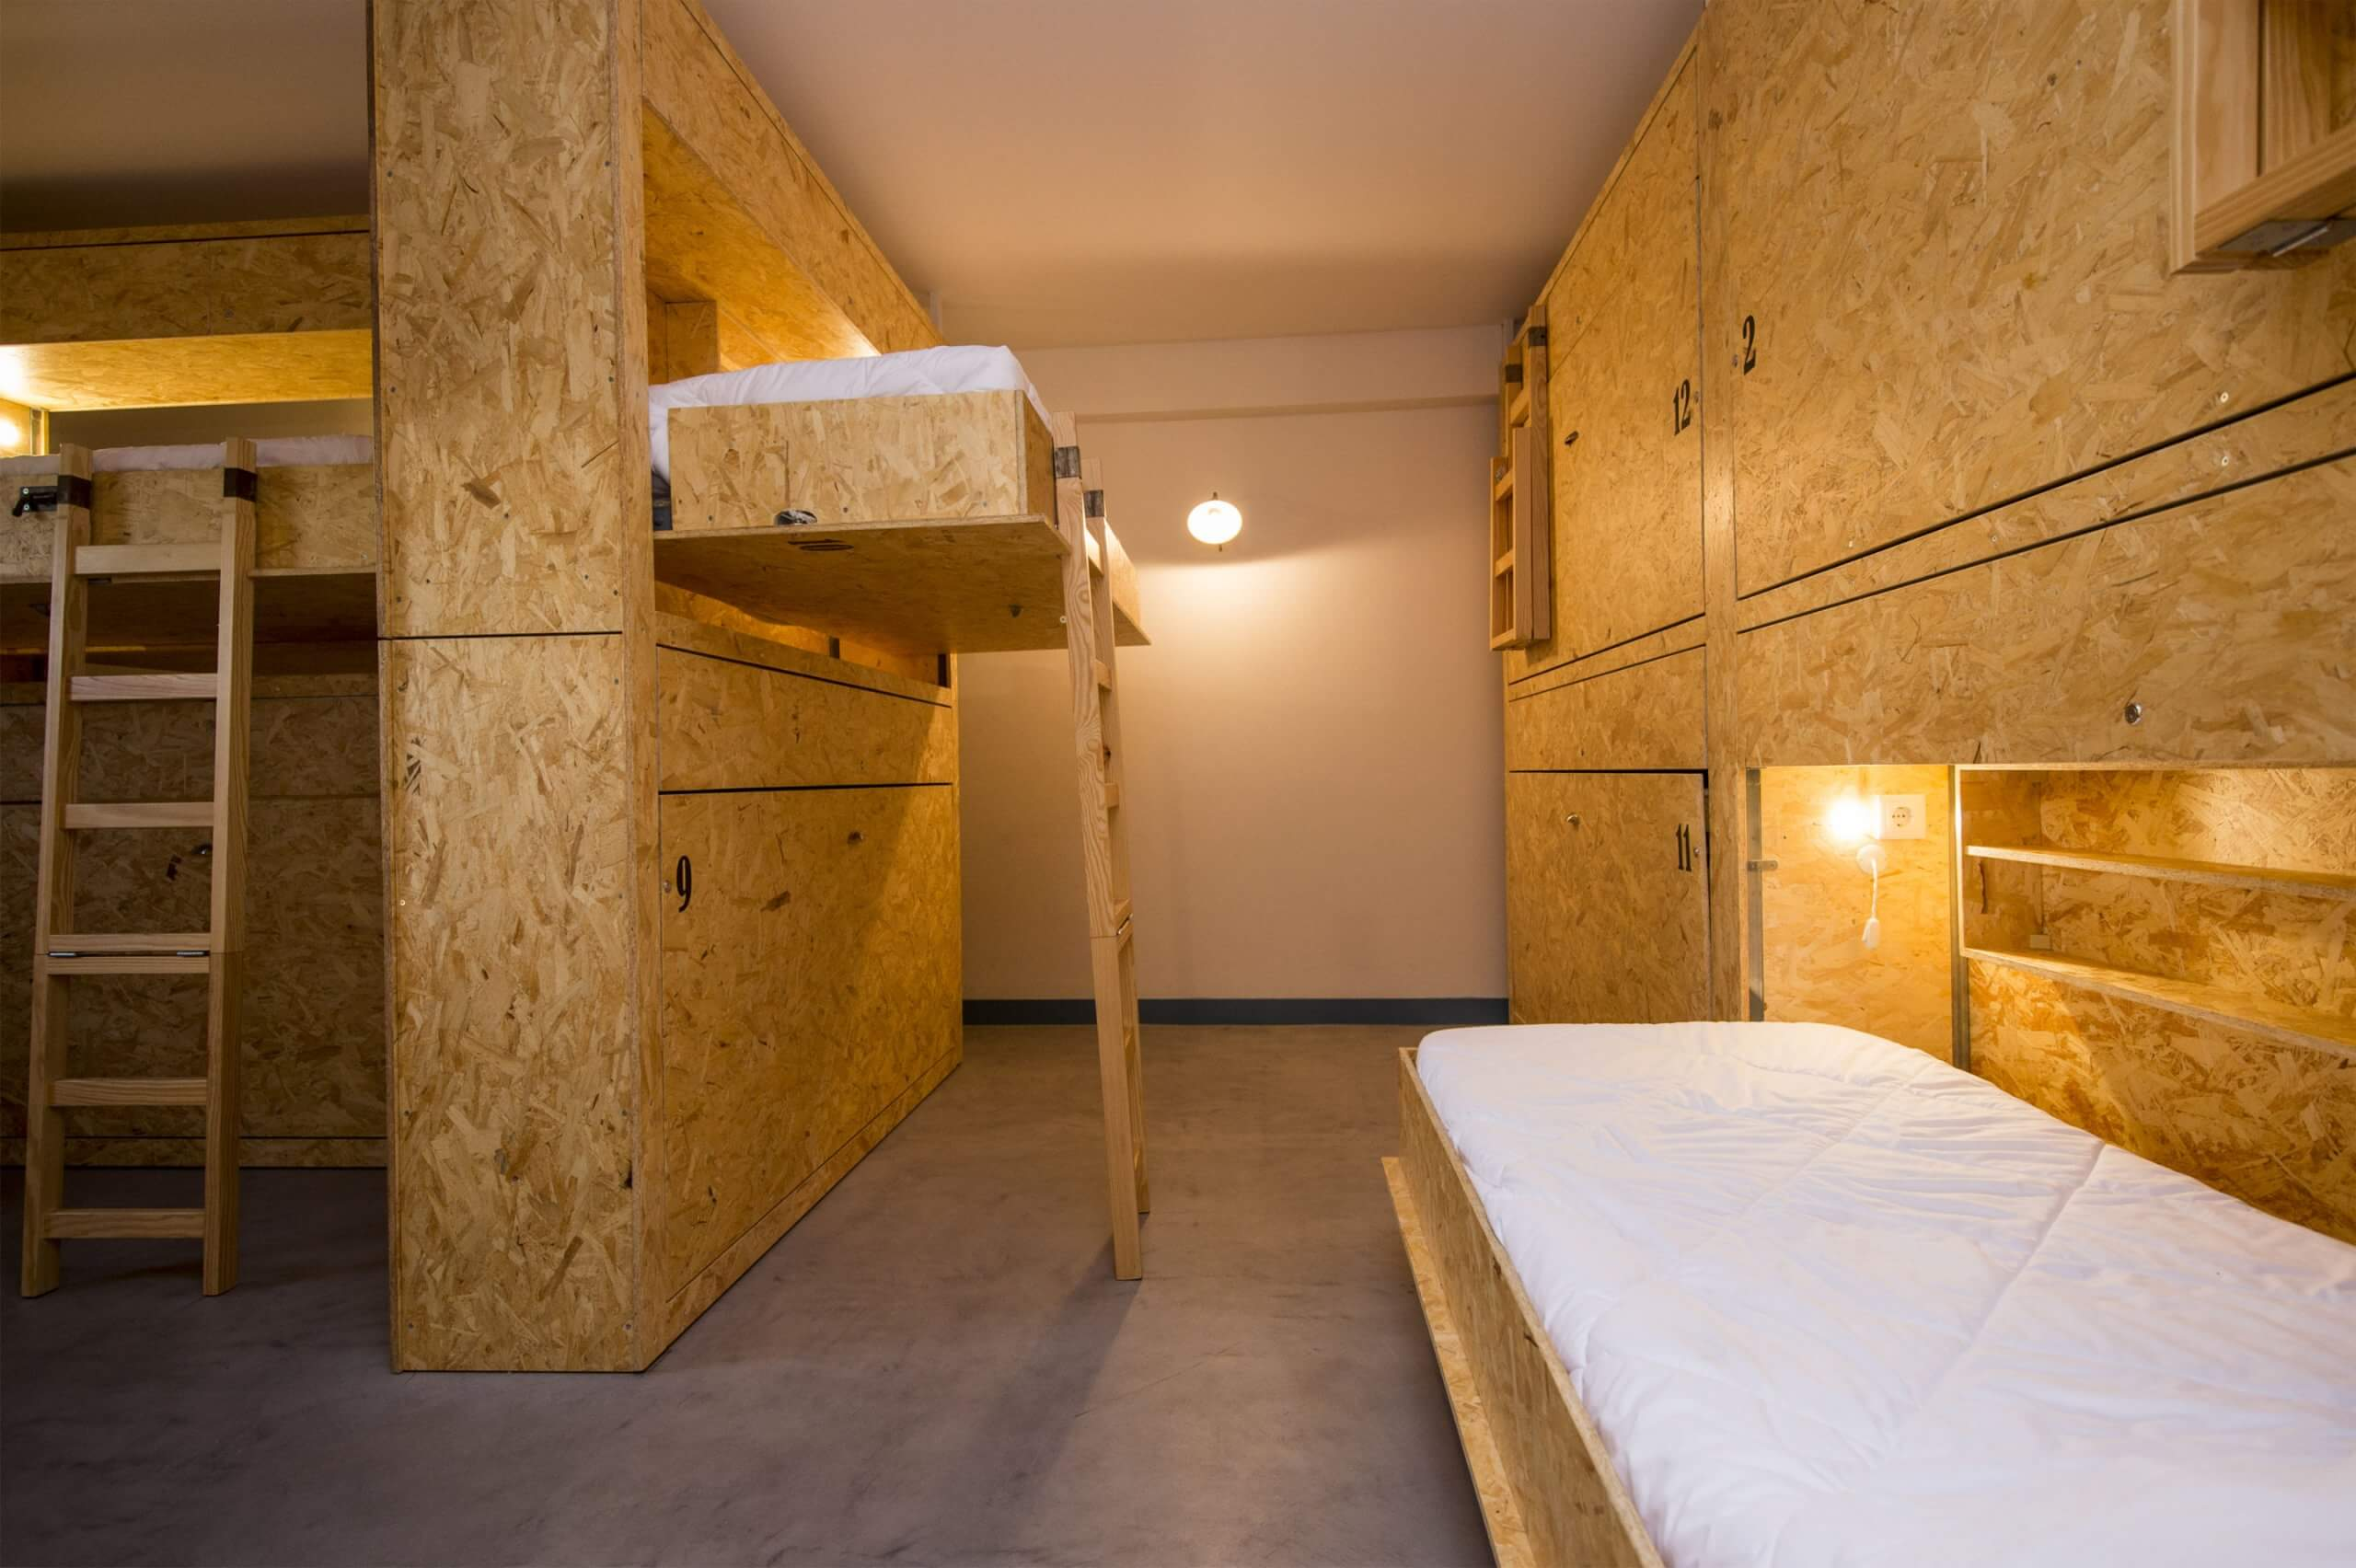 Hostel DesArts